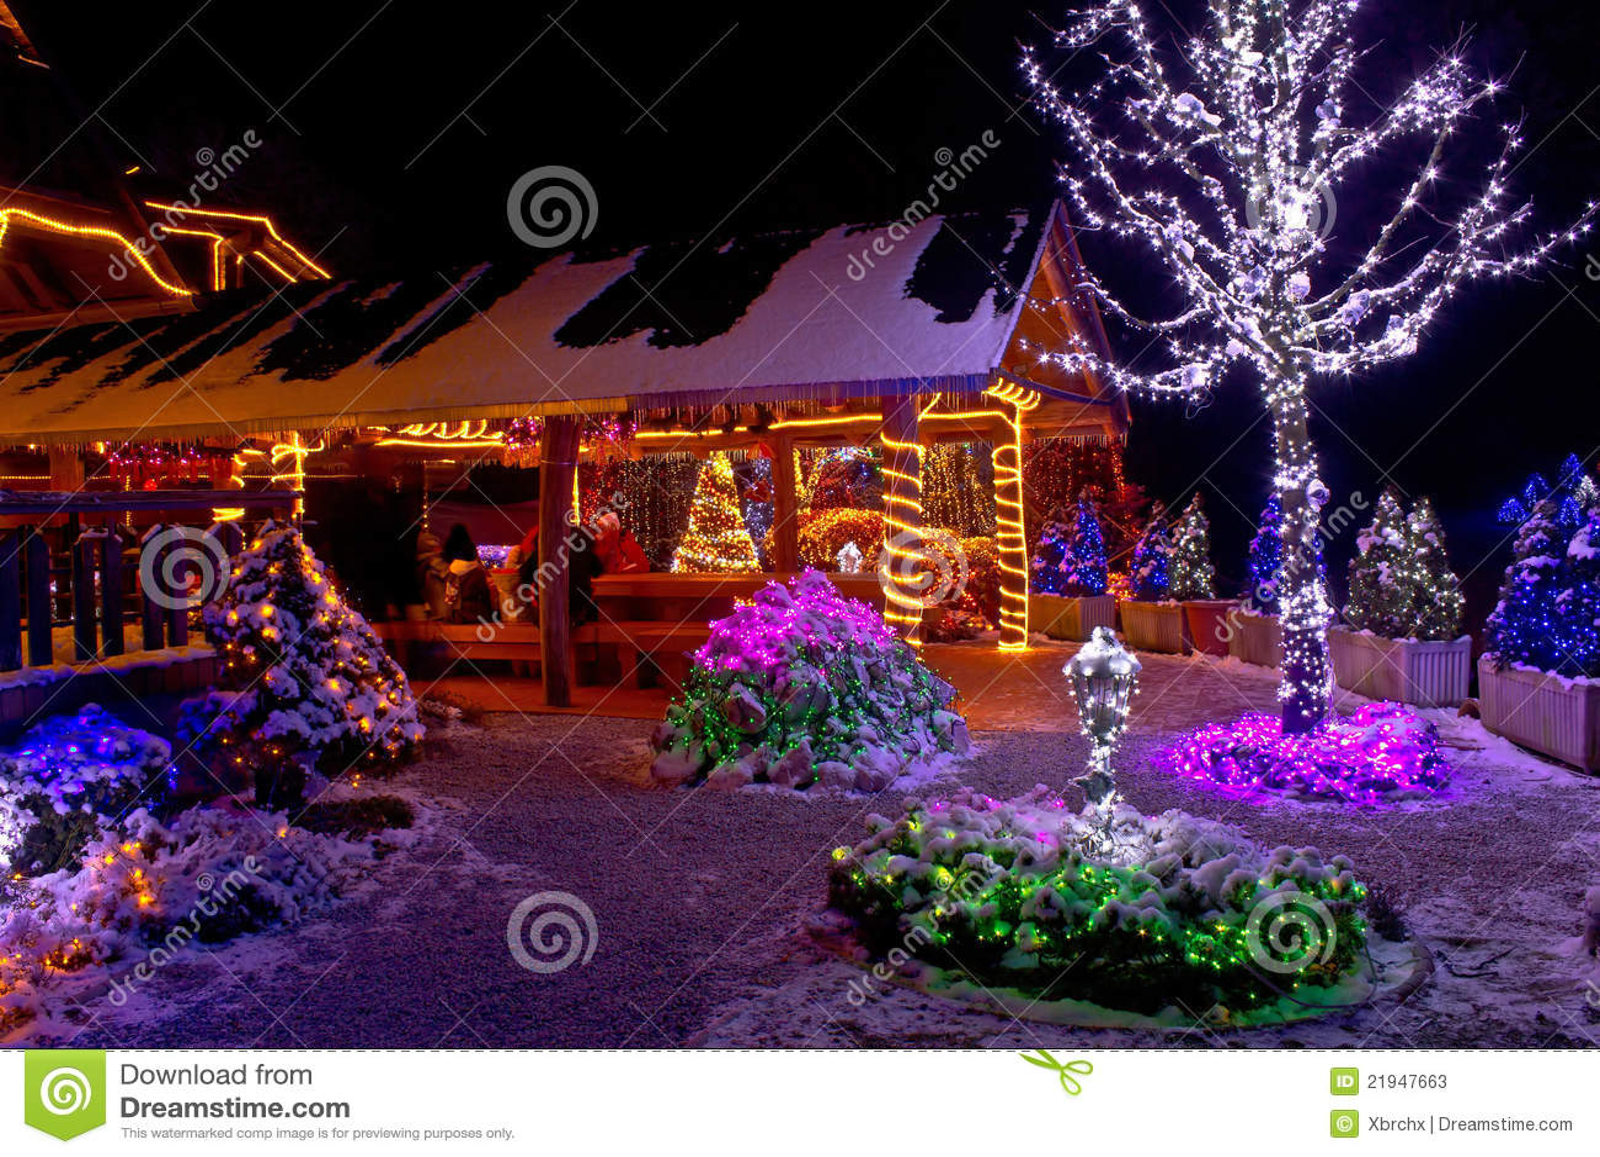 Christmas Fantasy Lodge And Tree Lights Stock Photos